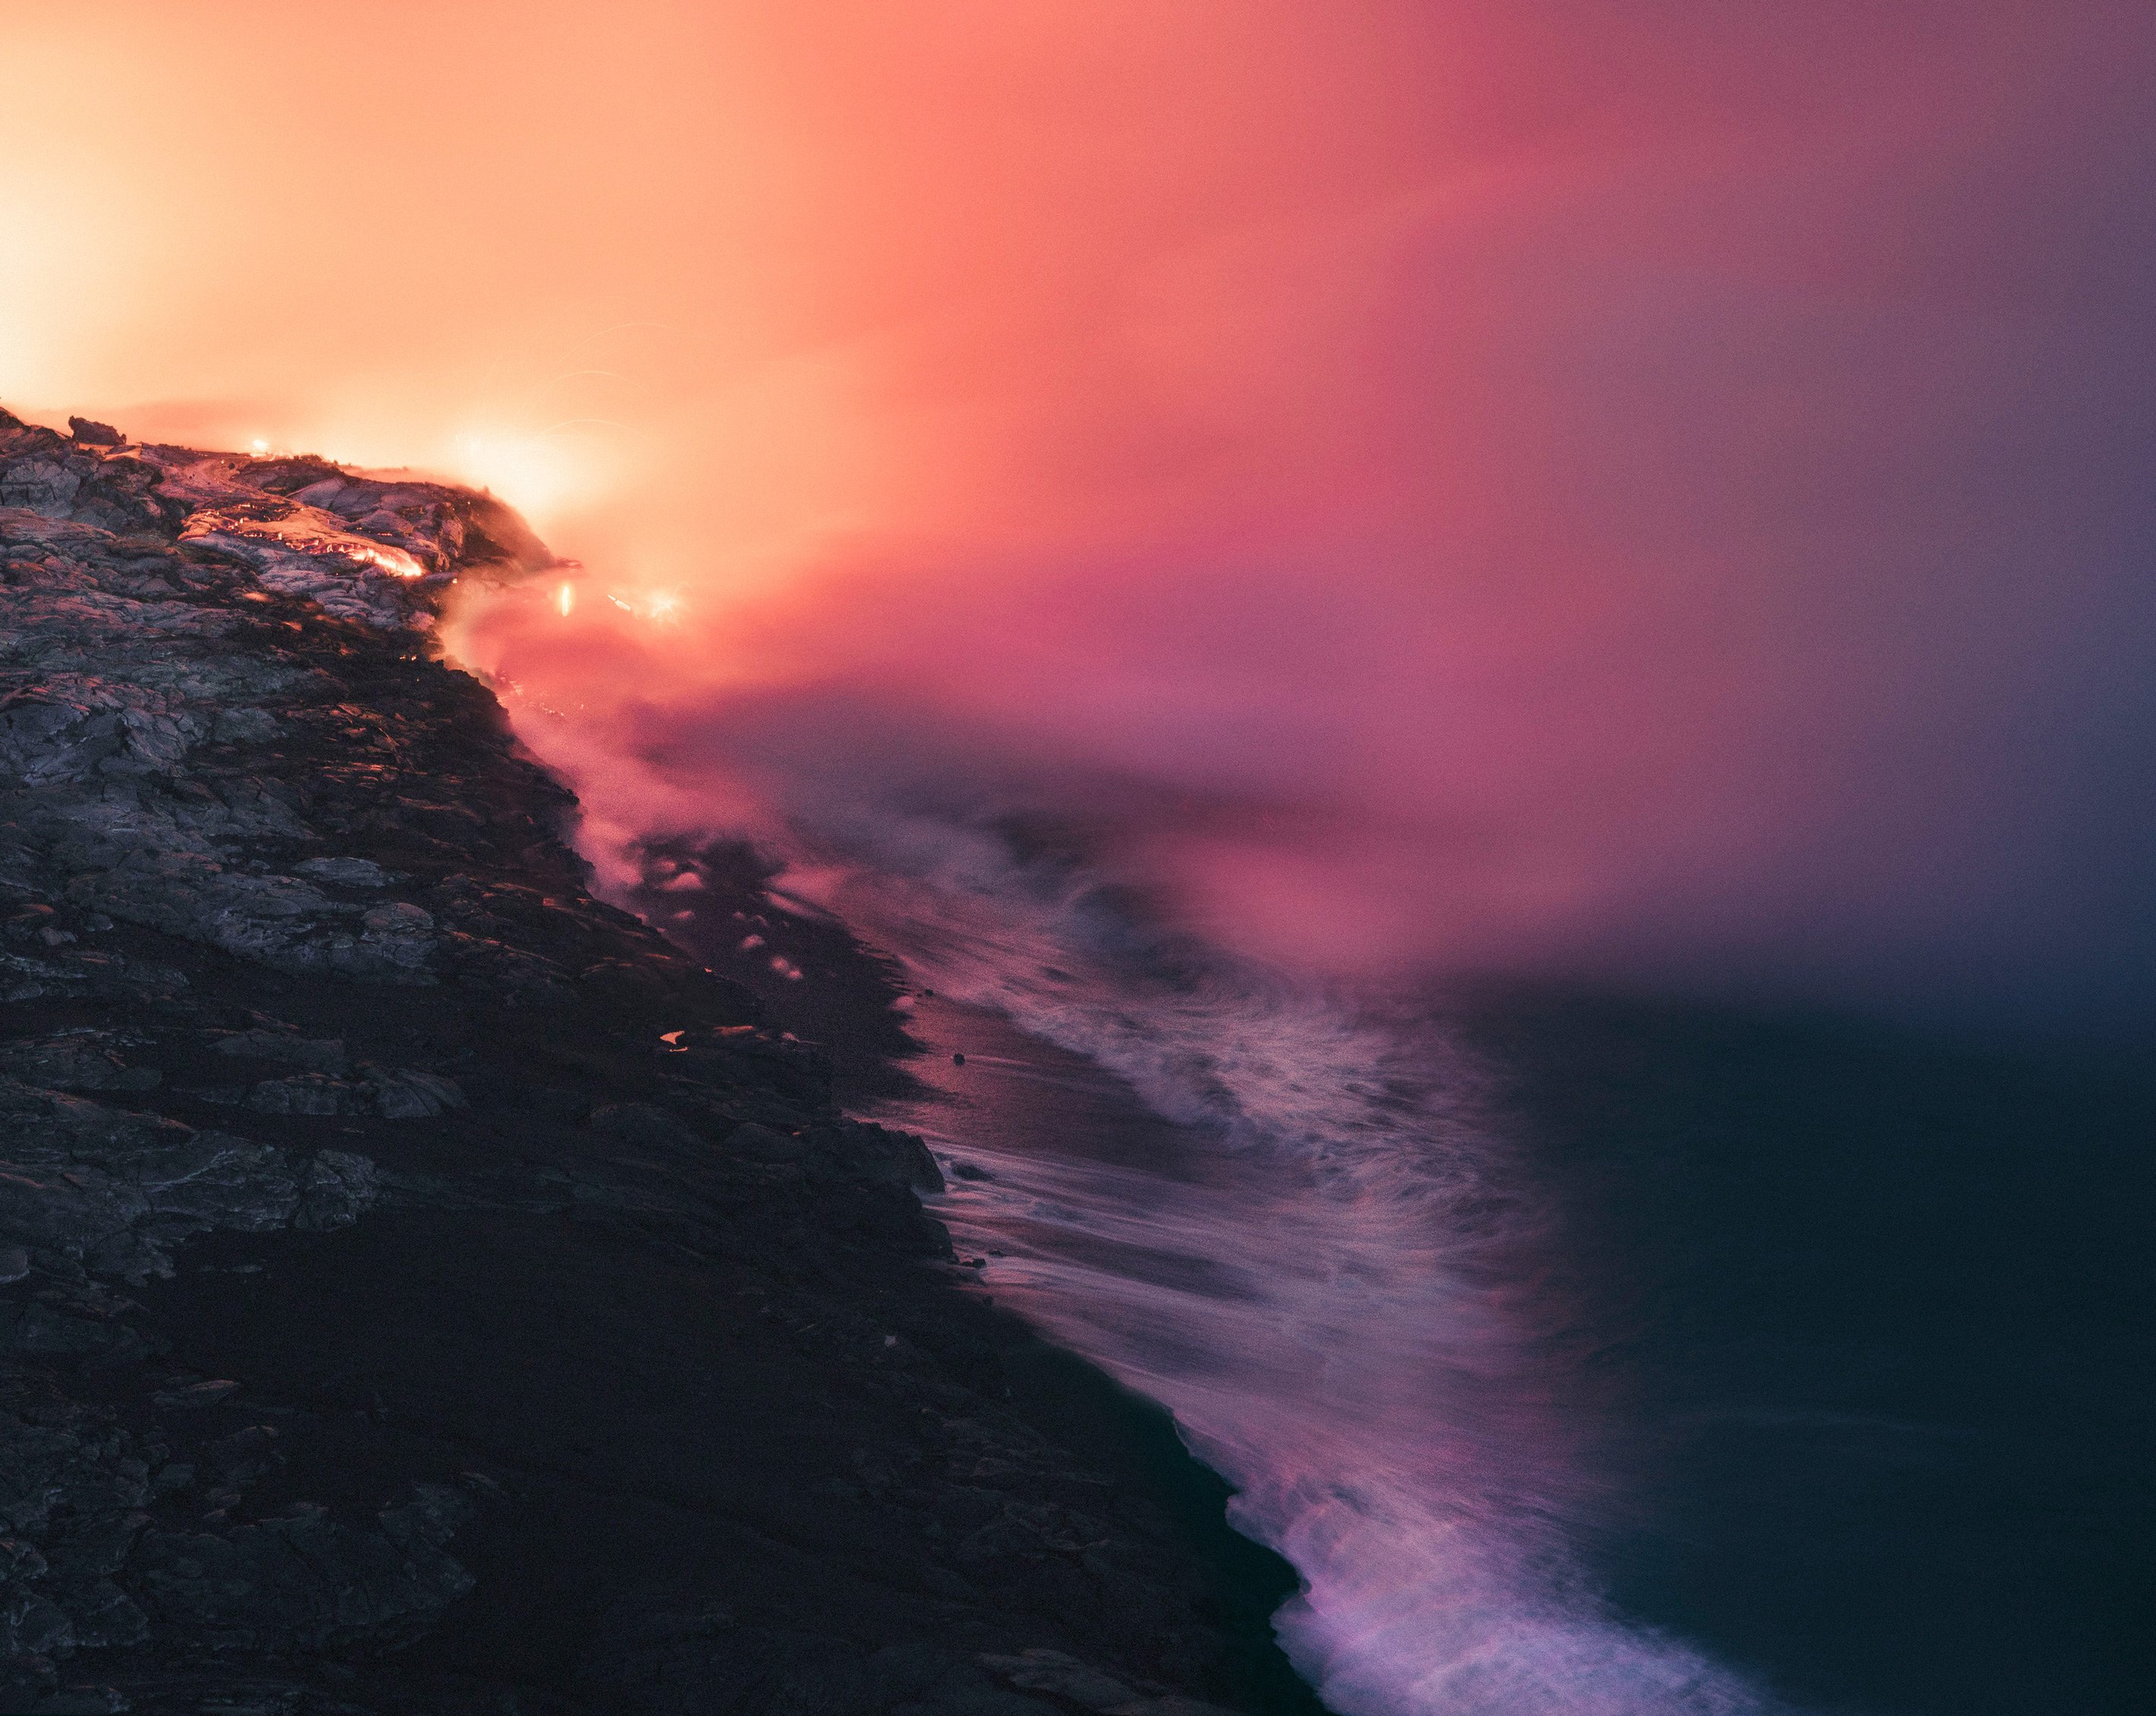 Immagine di paesaggio di fantascienza in un mondo di bellezza surreale ed eterea, fatta di infiniti colori e luce elettrica, di reuben wu